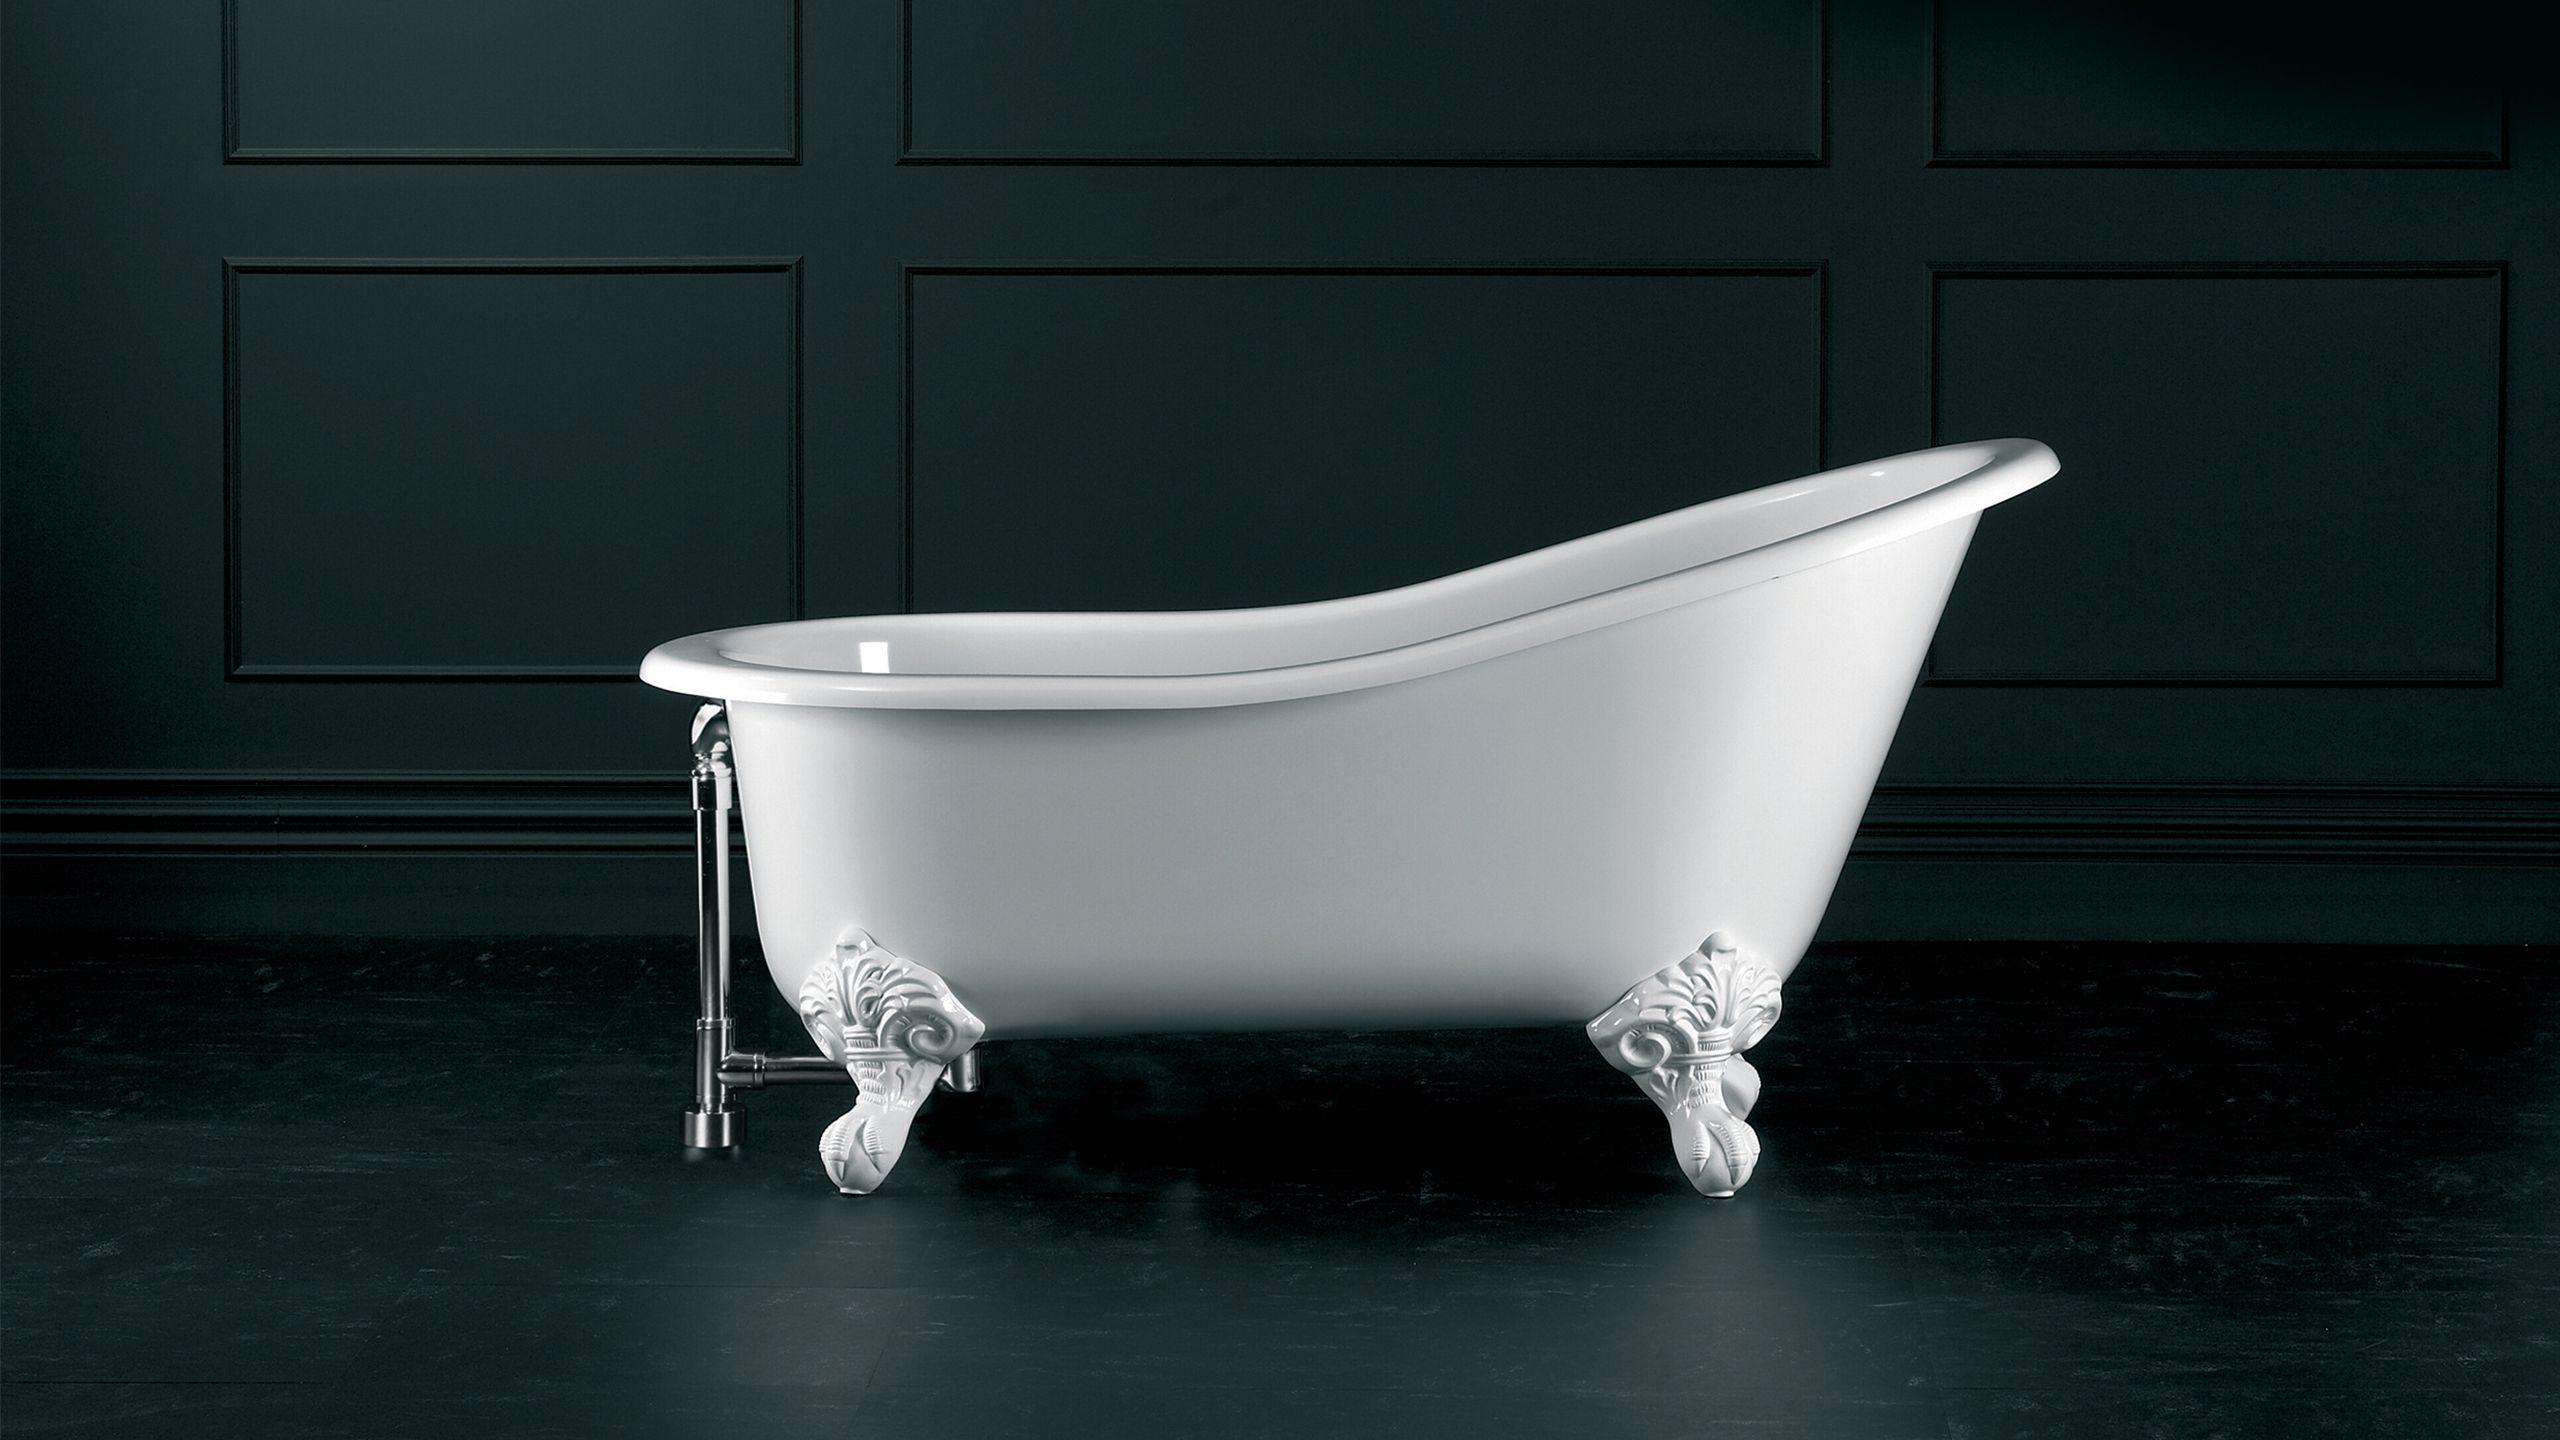 Shropshire  Clawfoot Slipper Tub - Victoria + Albert Baths